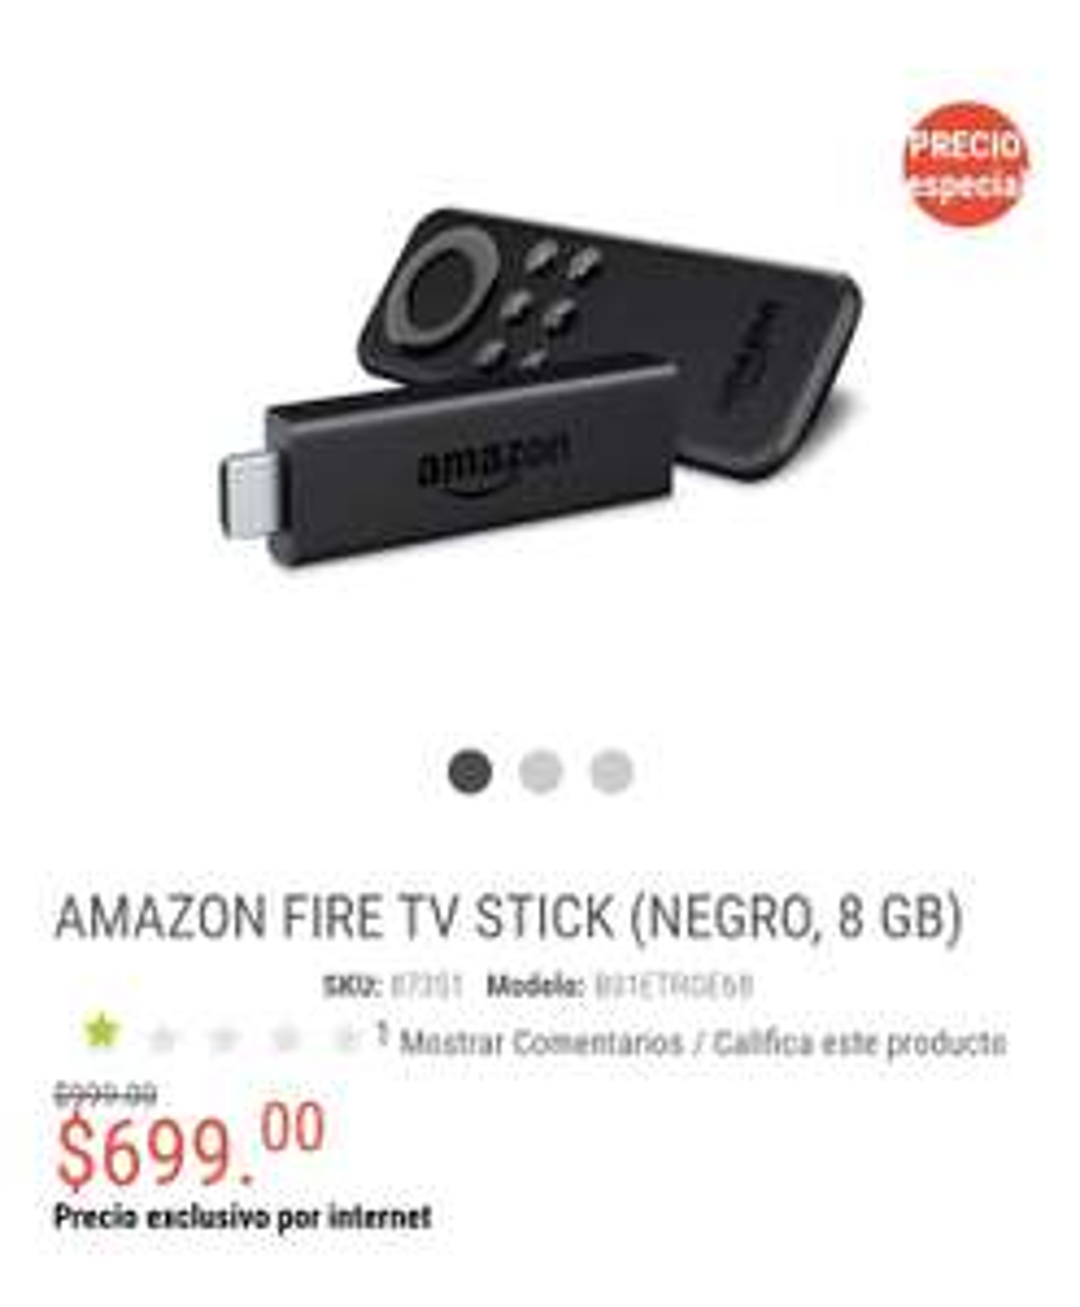 radioshack Amazon fire tv stick